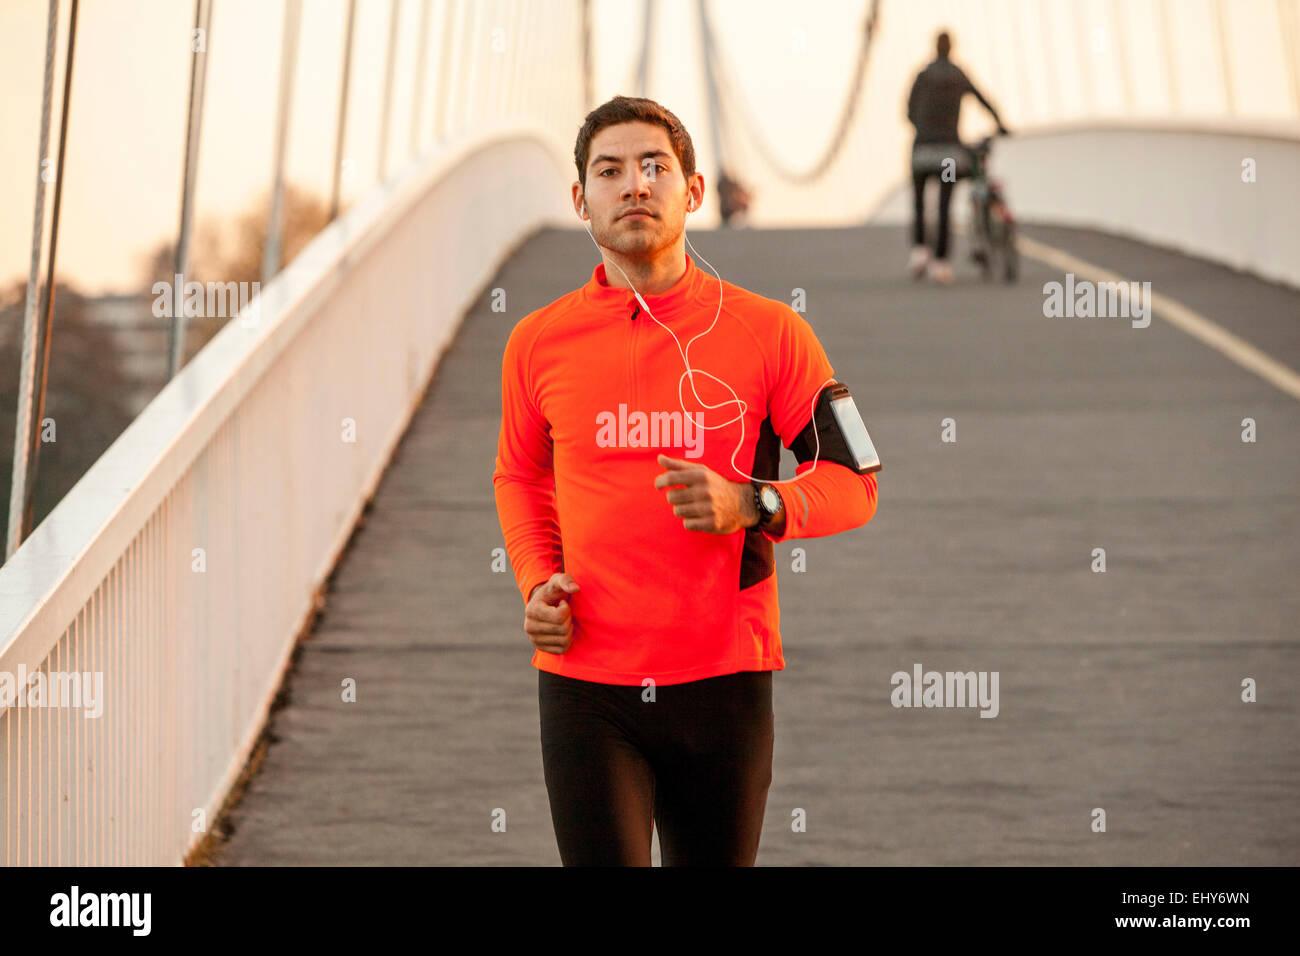 Male runner with headphones jogging over bridge - Stock Image